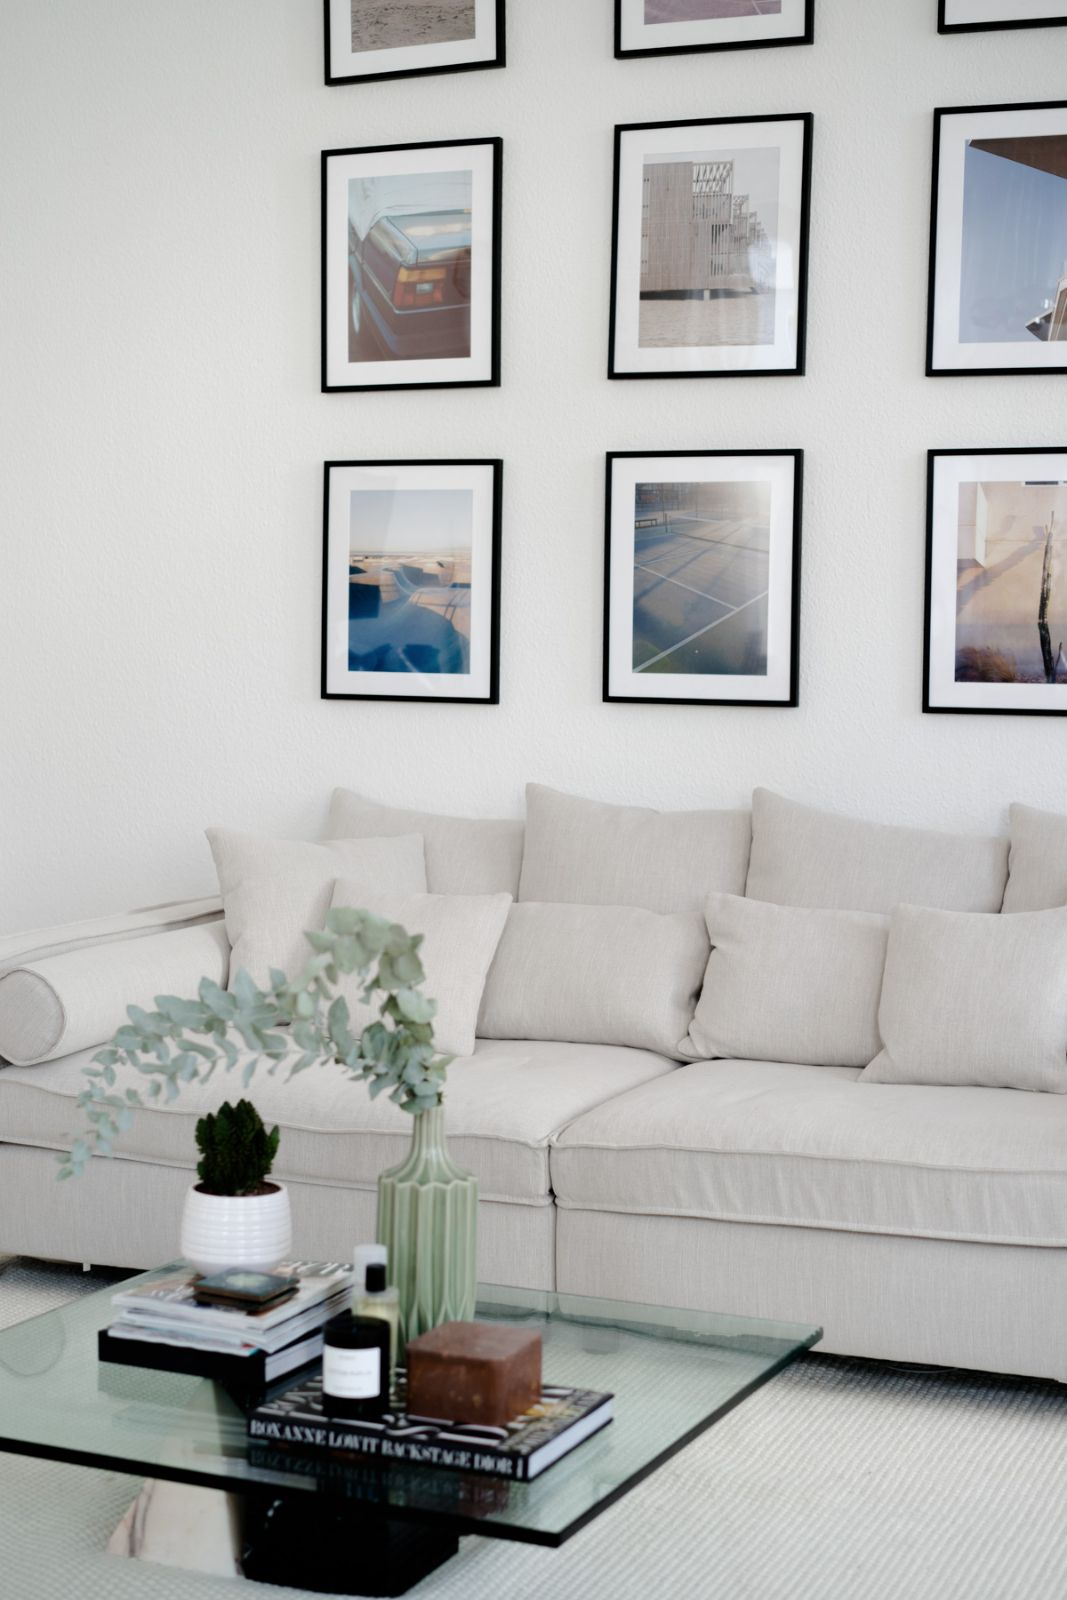 Unser neues sofa mr big von bolia vardagsrum big sofas sofa living room for Mr big live from the living room